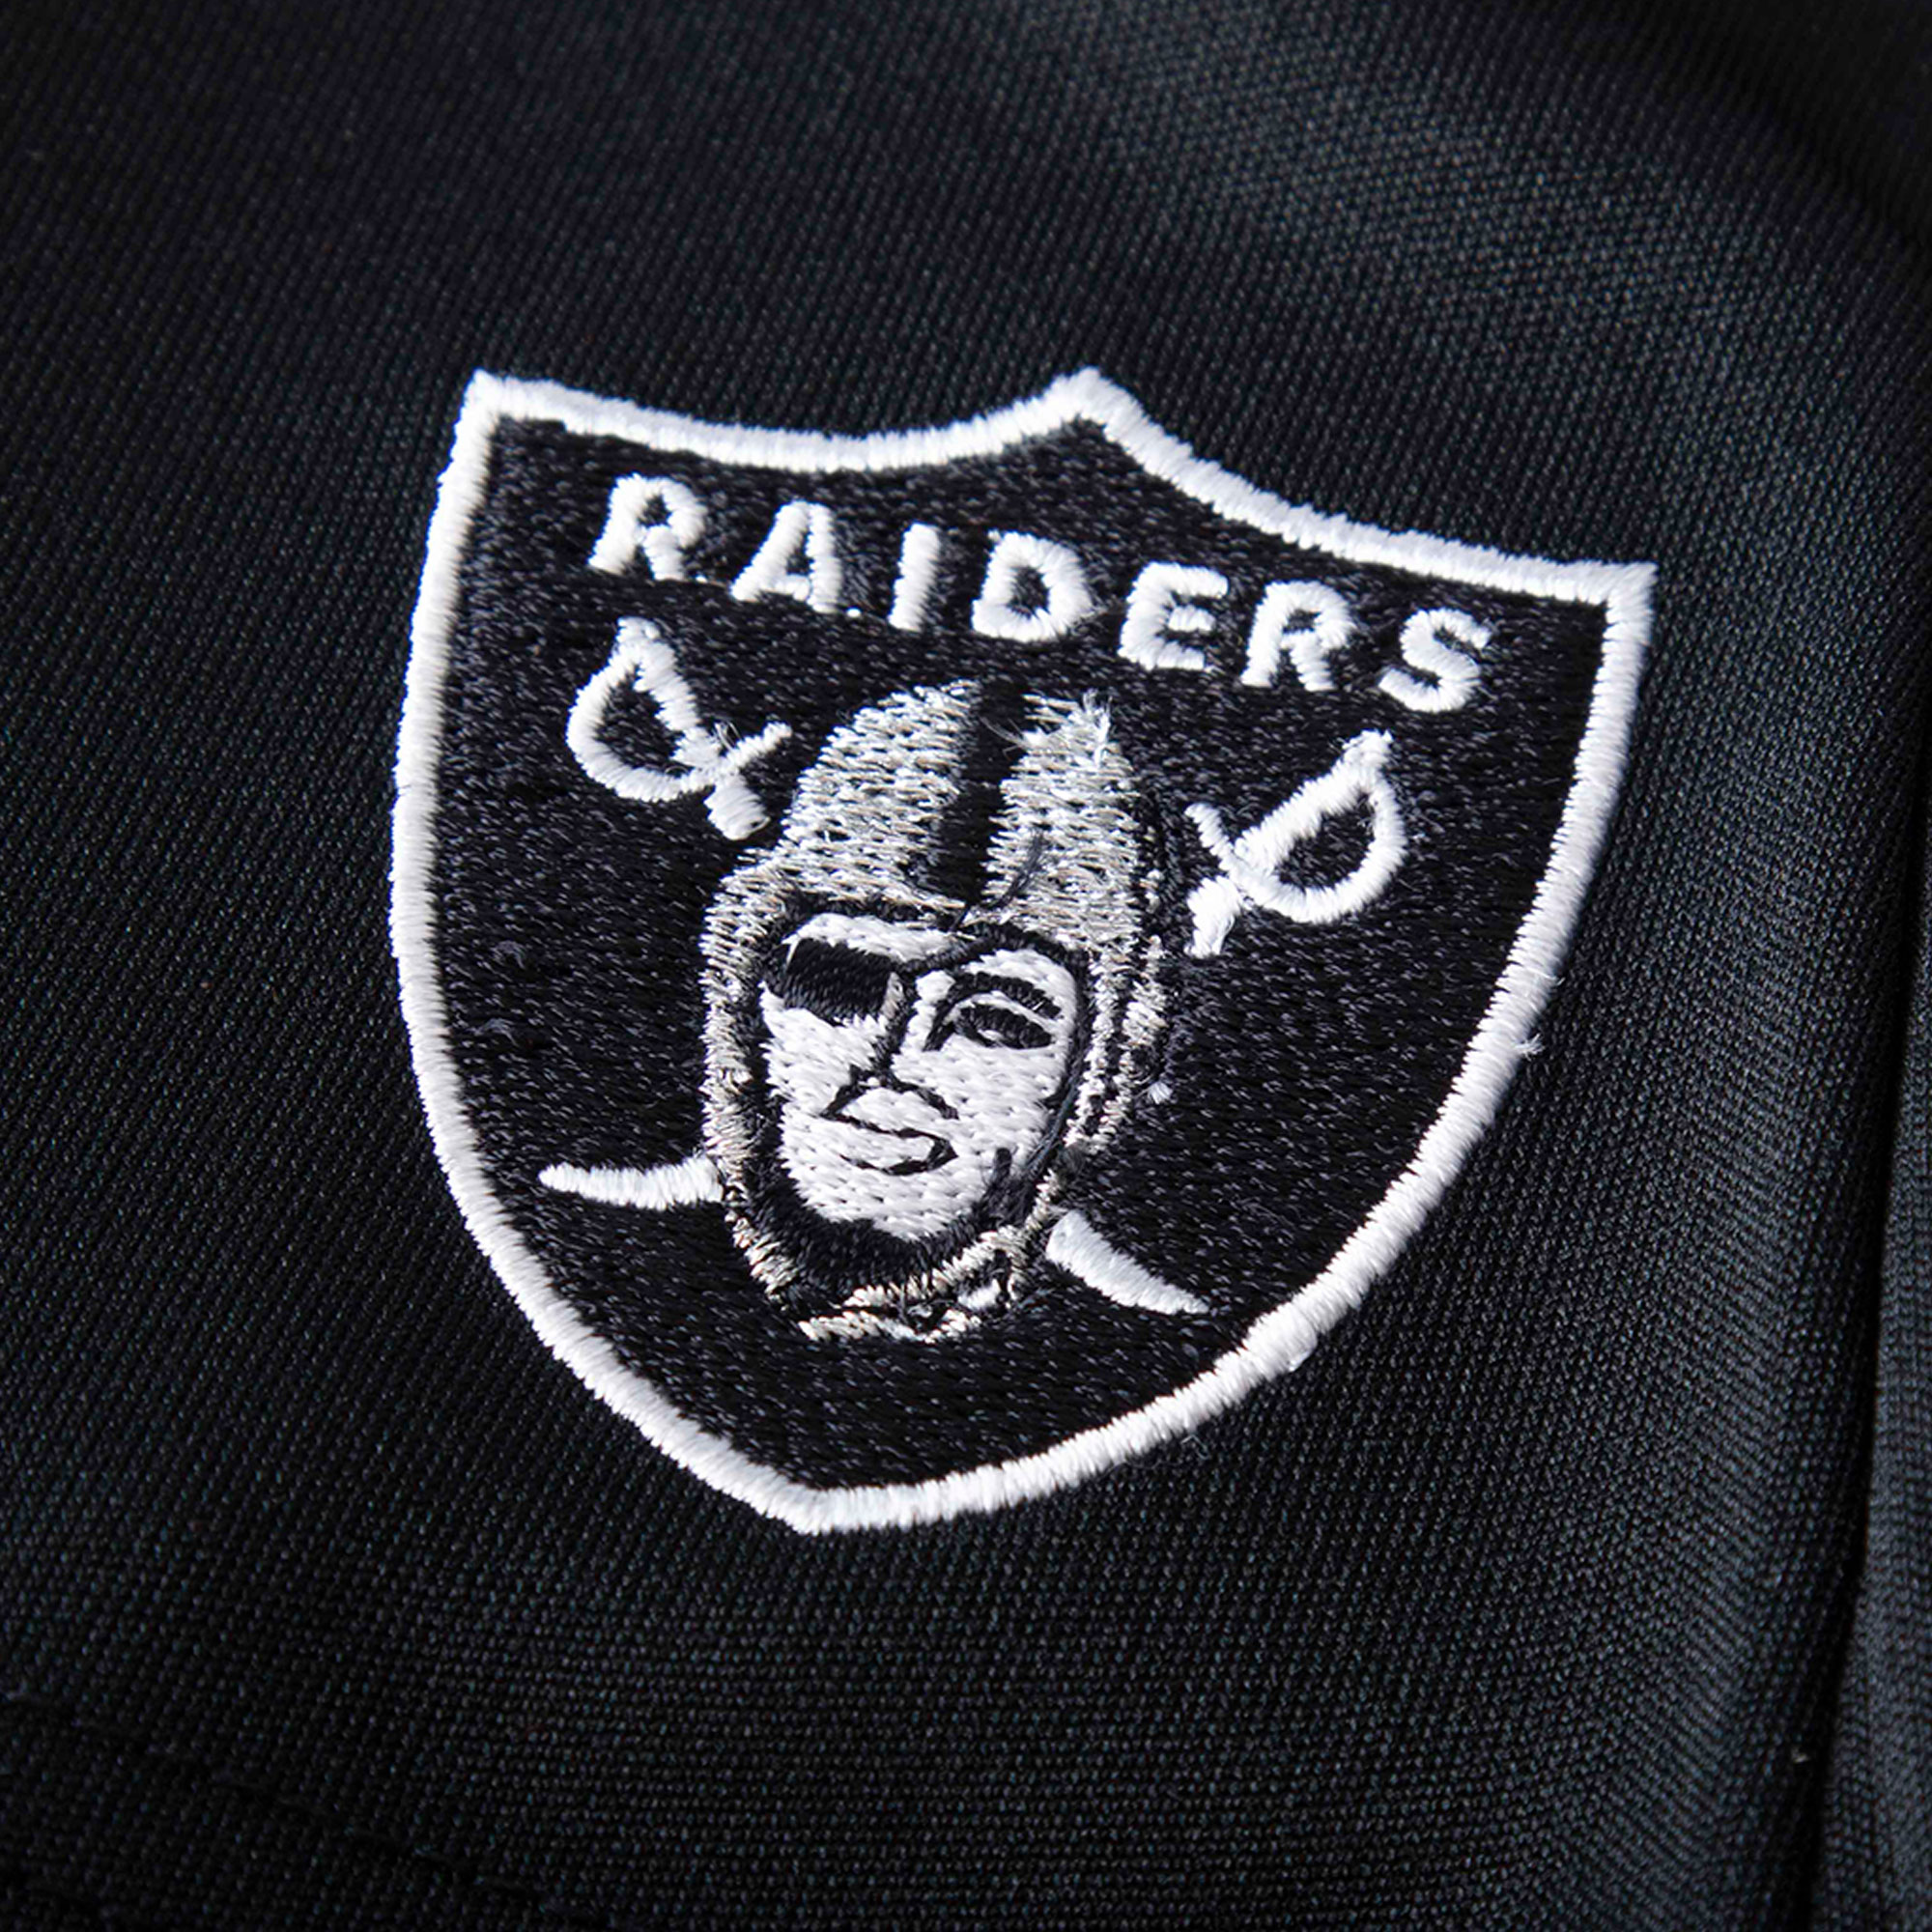 18e4941d27a Outerstuff - Oakland Raiders Girls Toddler Two-Piece Spirit Cheerleader Set  with Bloomers - Black Gray - Walmart.com